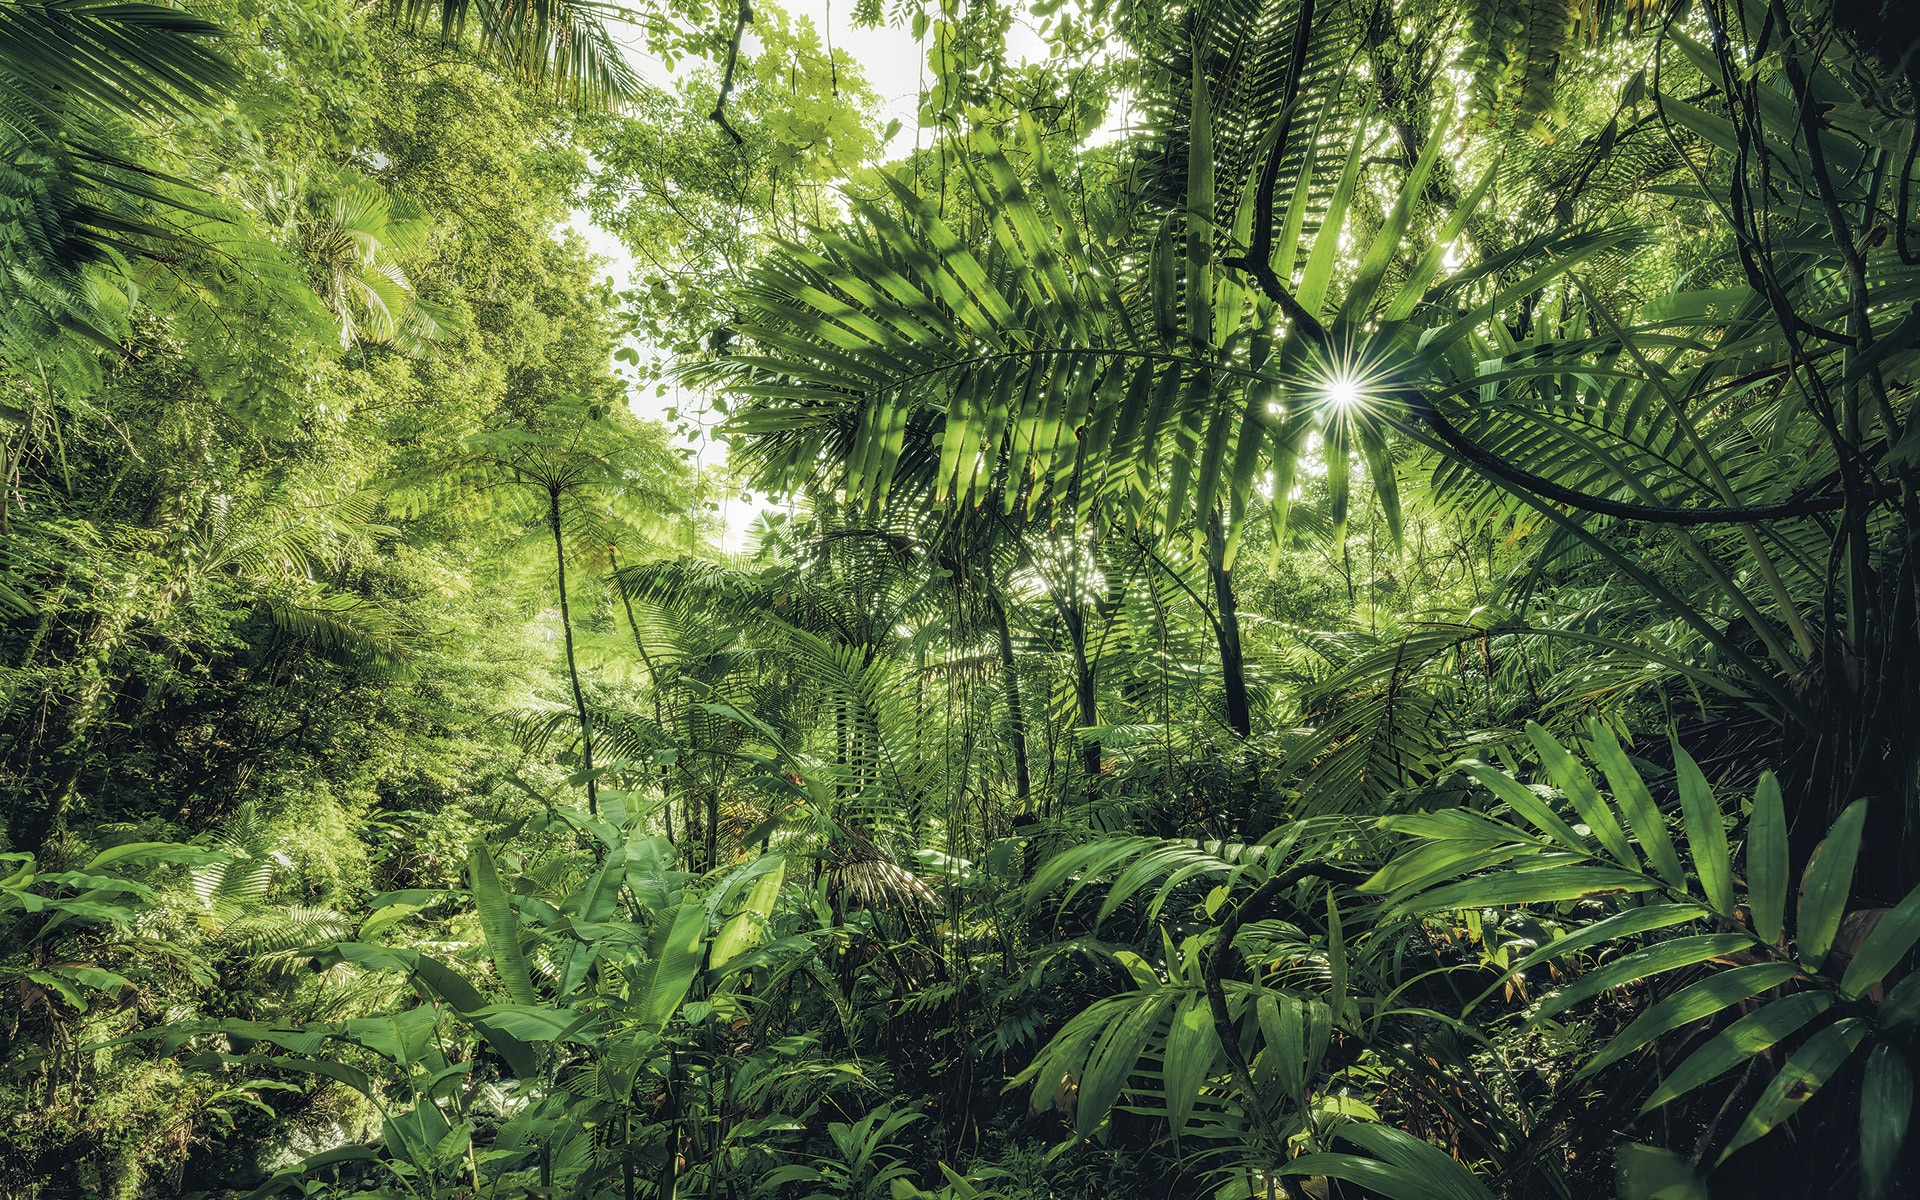 jungle, Top 10 Most Beautiful Jungles of the World (Updated 2021), Phenomenal Place